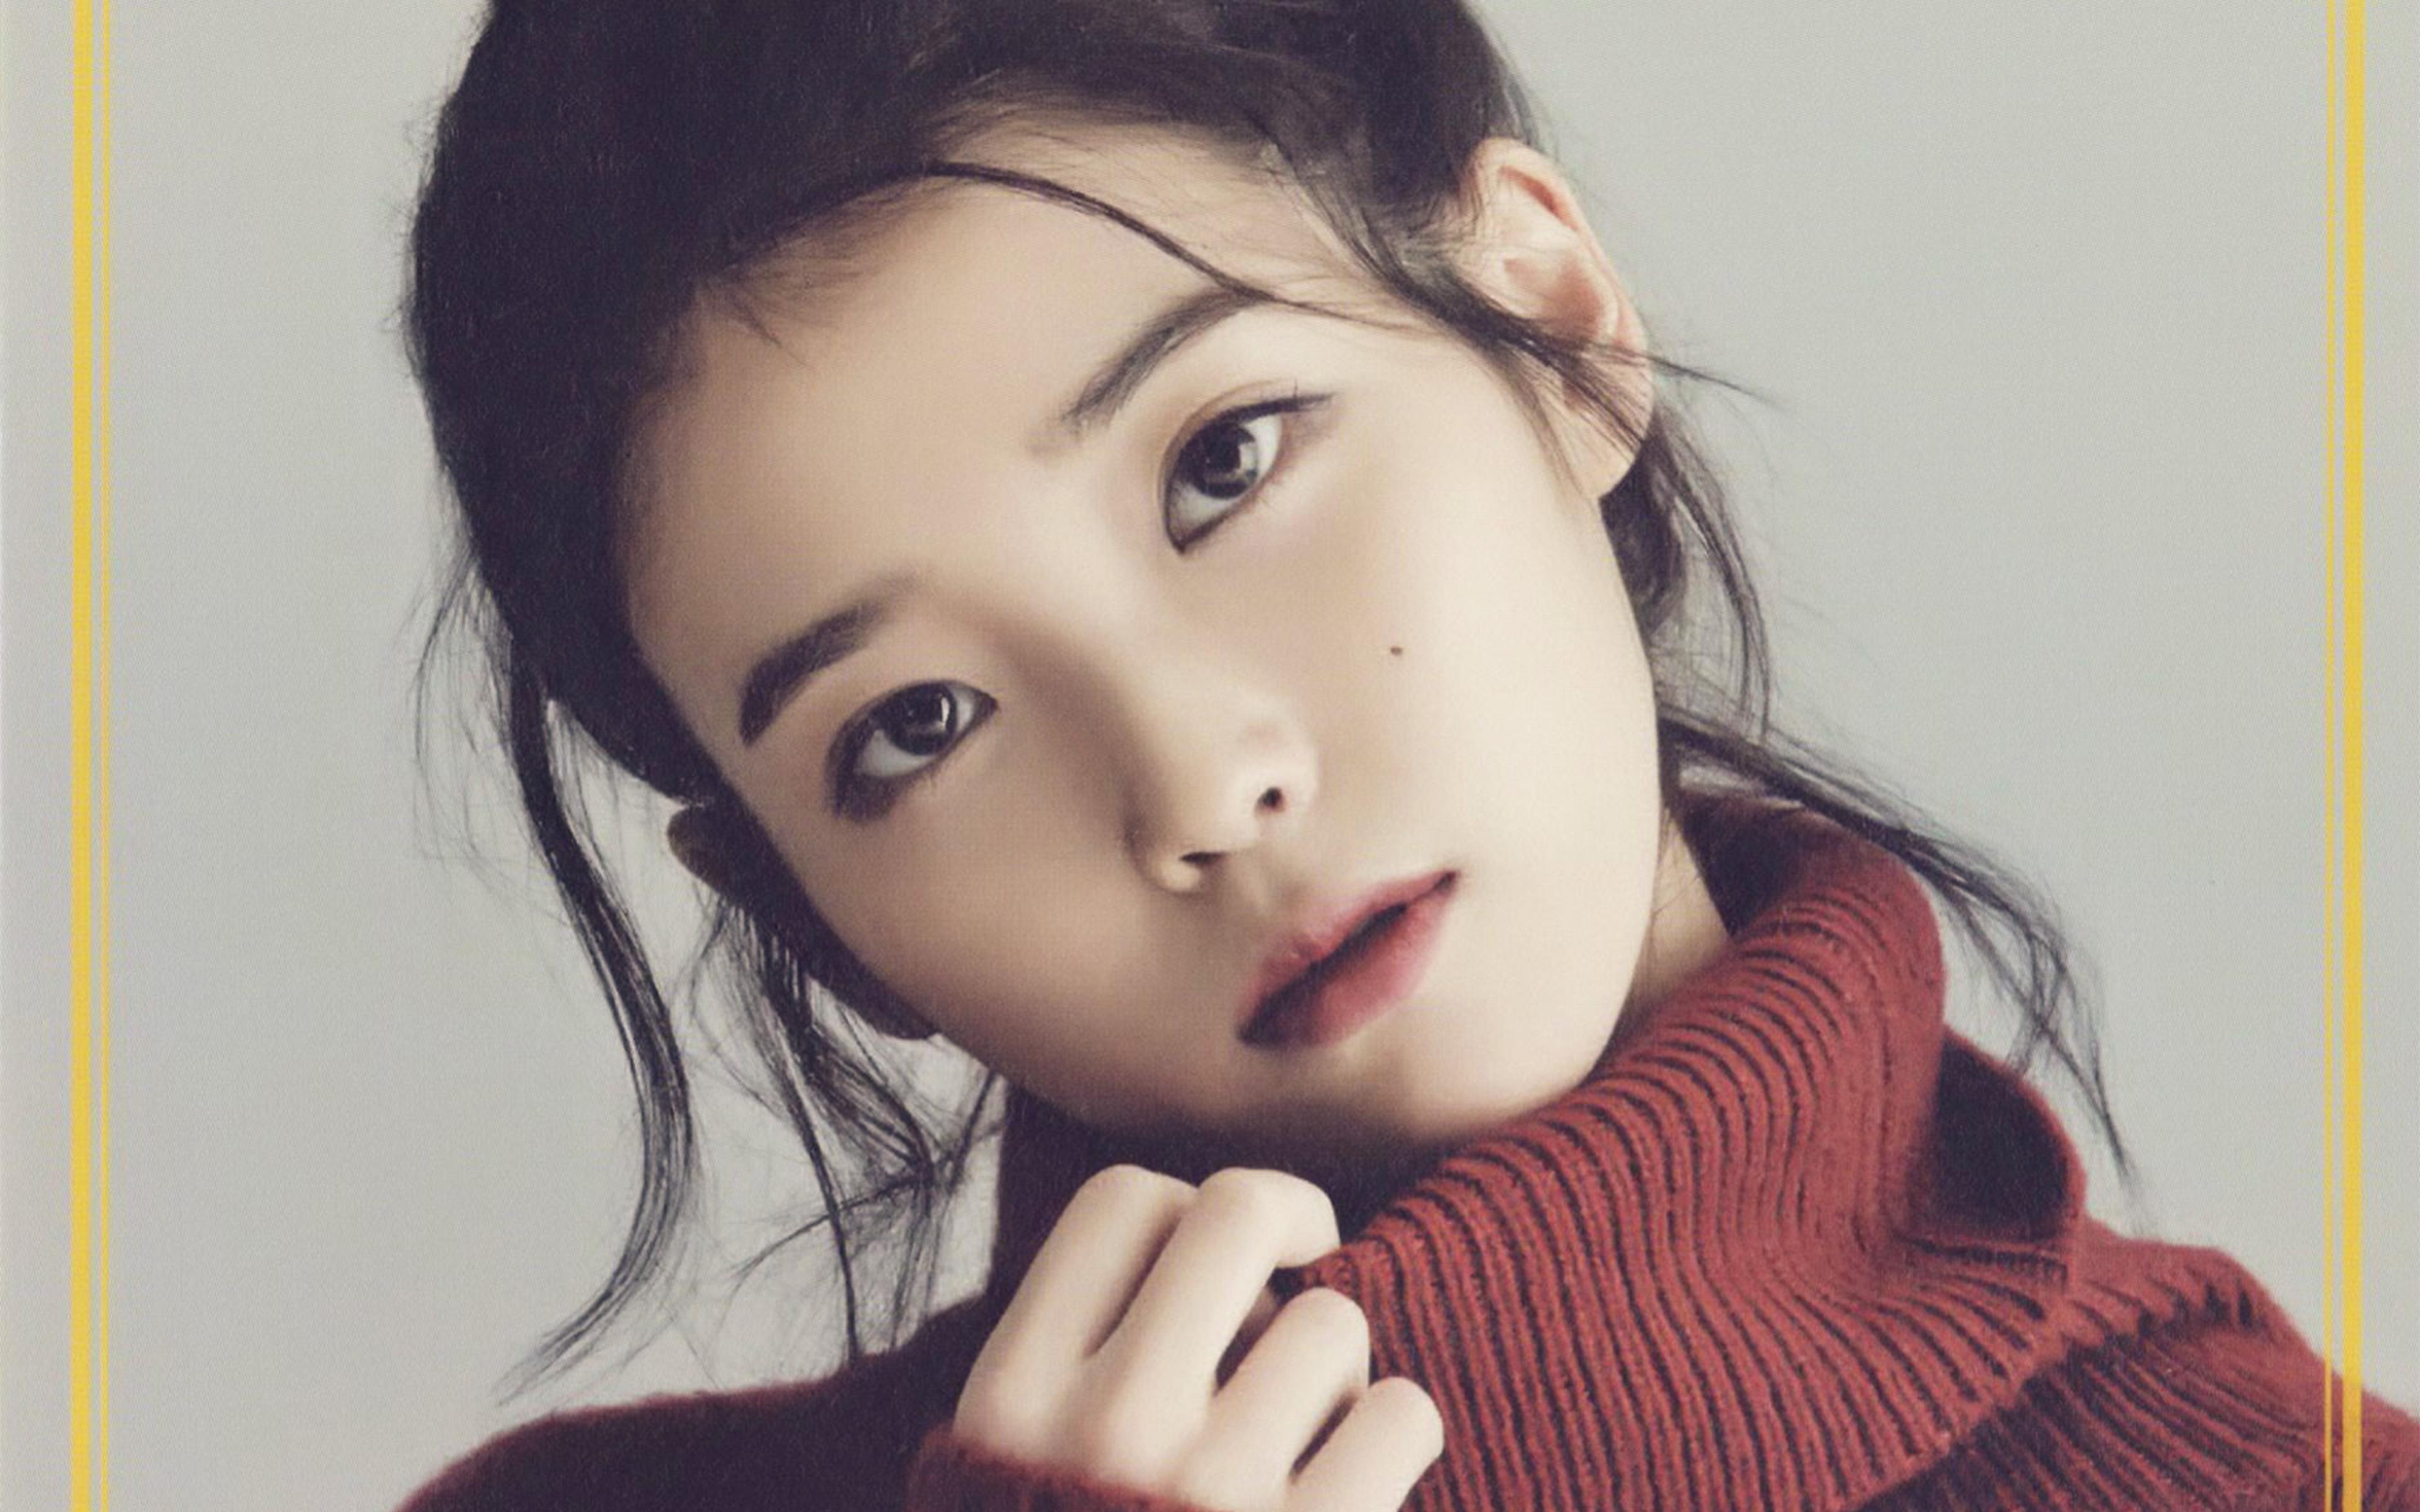 Wallpaper Cute Girl Cartoon Hd Hn83 Iu Kpop Girl Singer Artist Cute Wallpaper